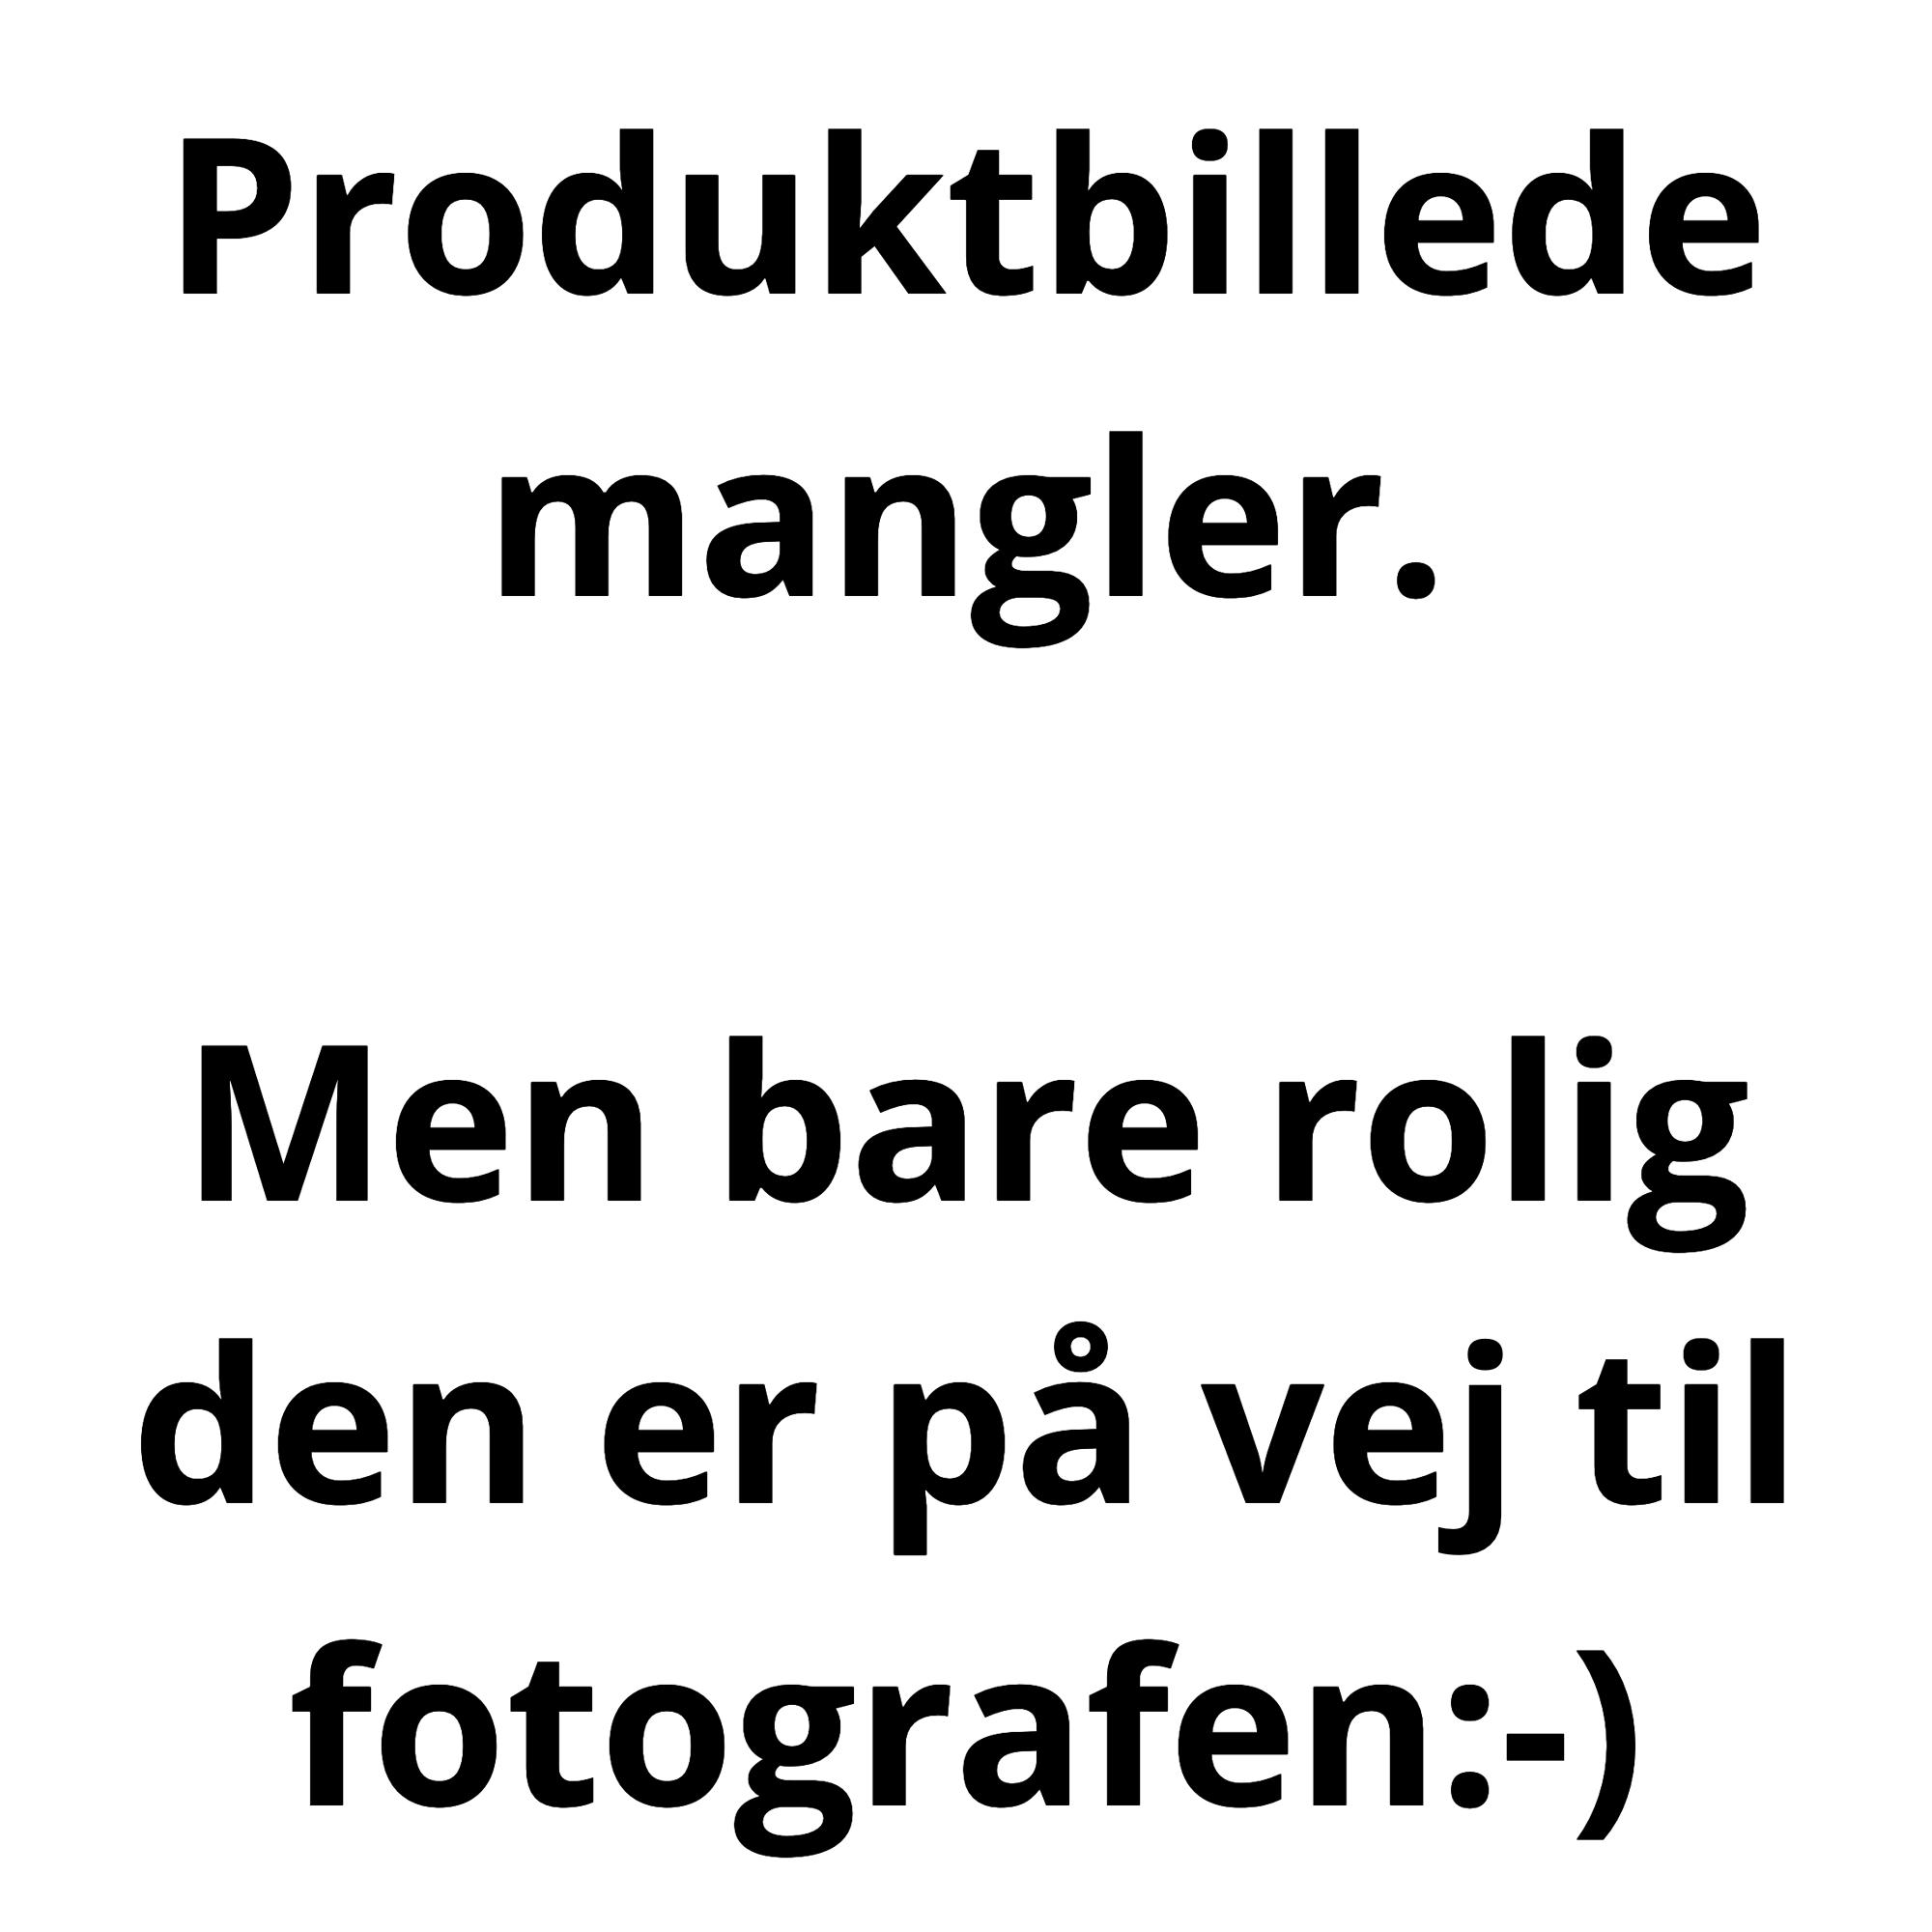 Brodit Faststrøms Aktiv mobilholder til Apple iPhone 6 Plus/6S Plus/7 Plus/8 Plus/X/XR/Xs/Xs Max med beskyttelsescover B:75-89 D:6-10mm - 527667